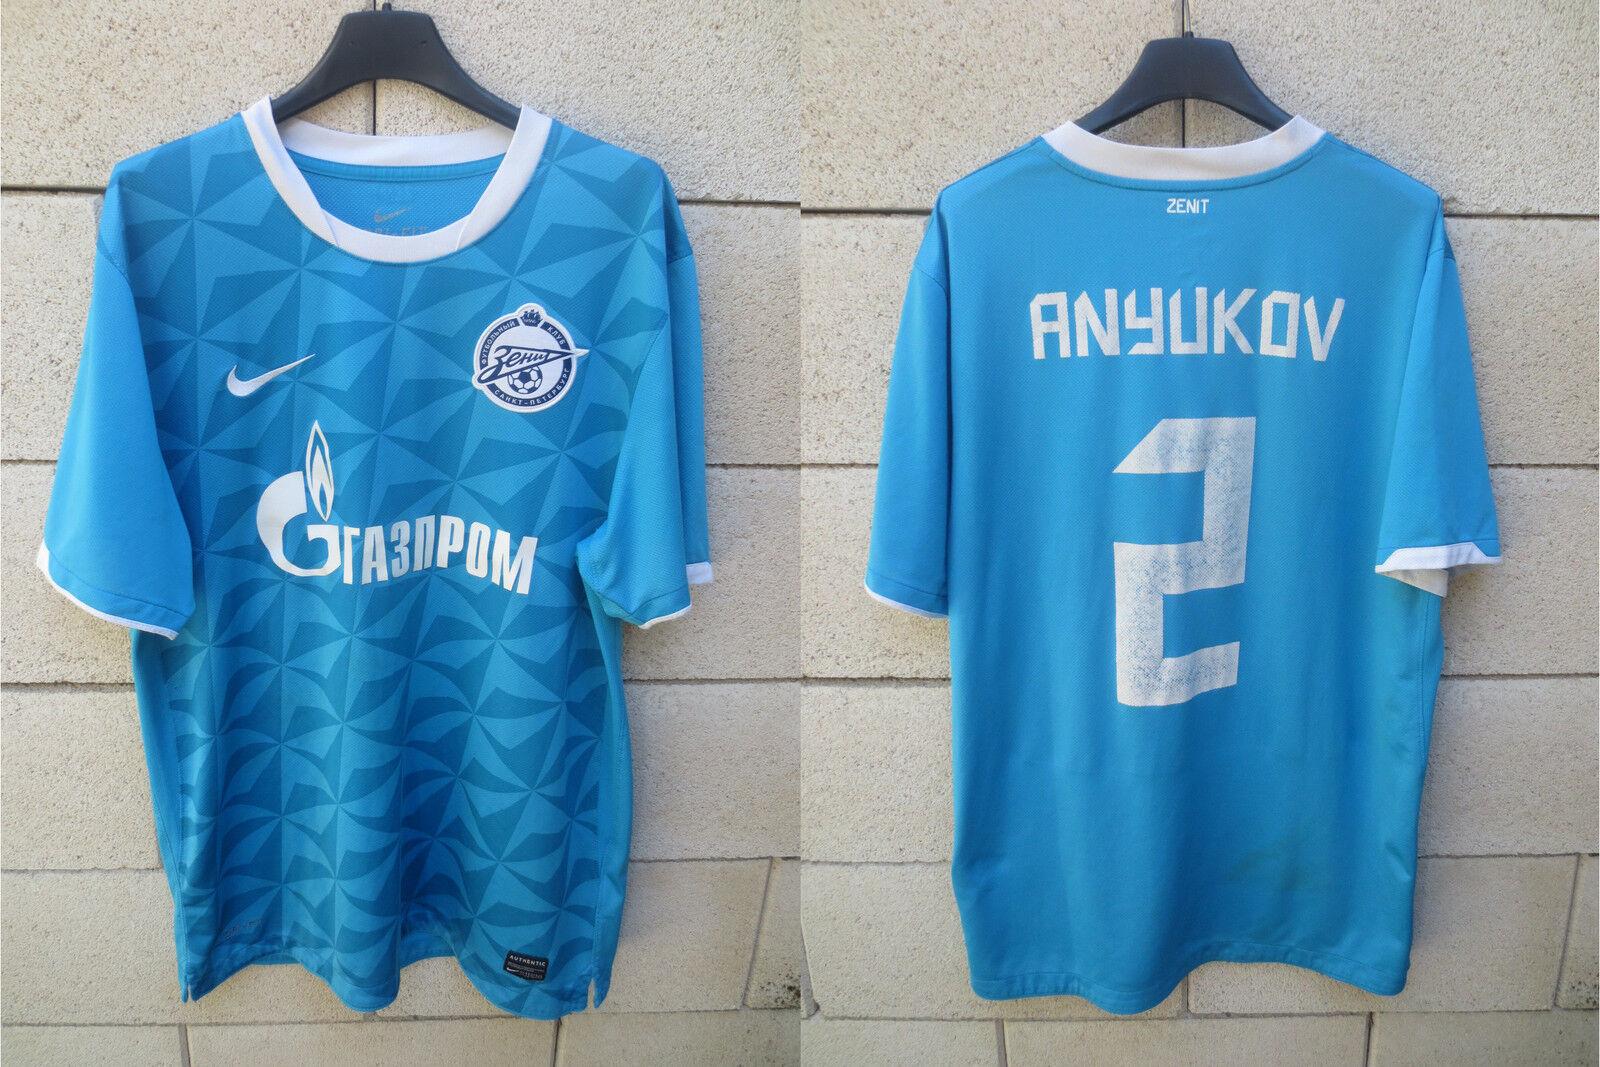 c8a1ae559ea Maillot ZENIT ST PETERSBURG shirt trikot ANYUKOV n°2 football Russie blue L  NIKE nuzhkn5056-Clubs russes